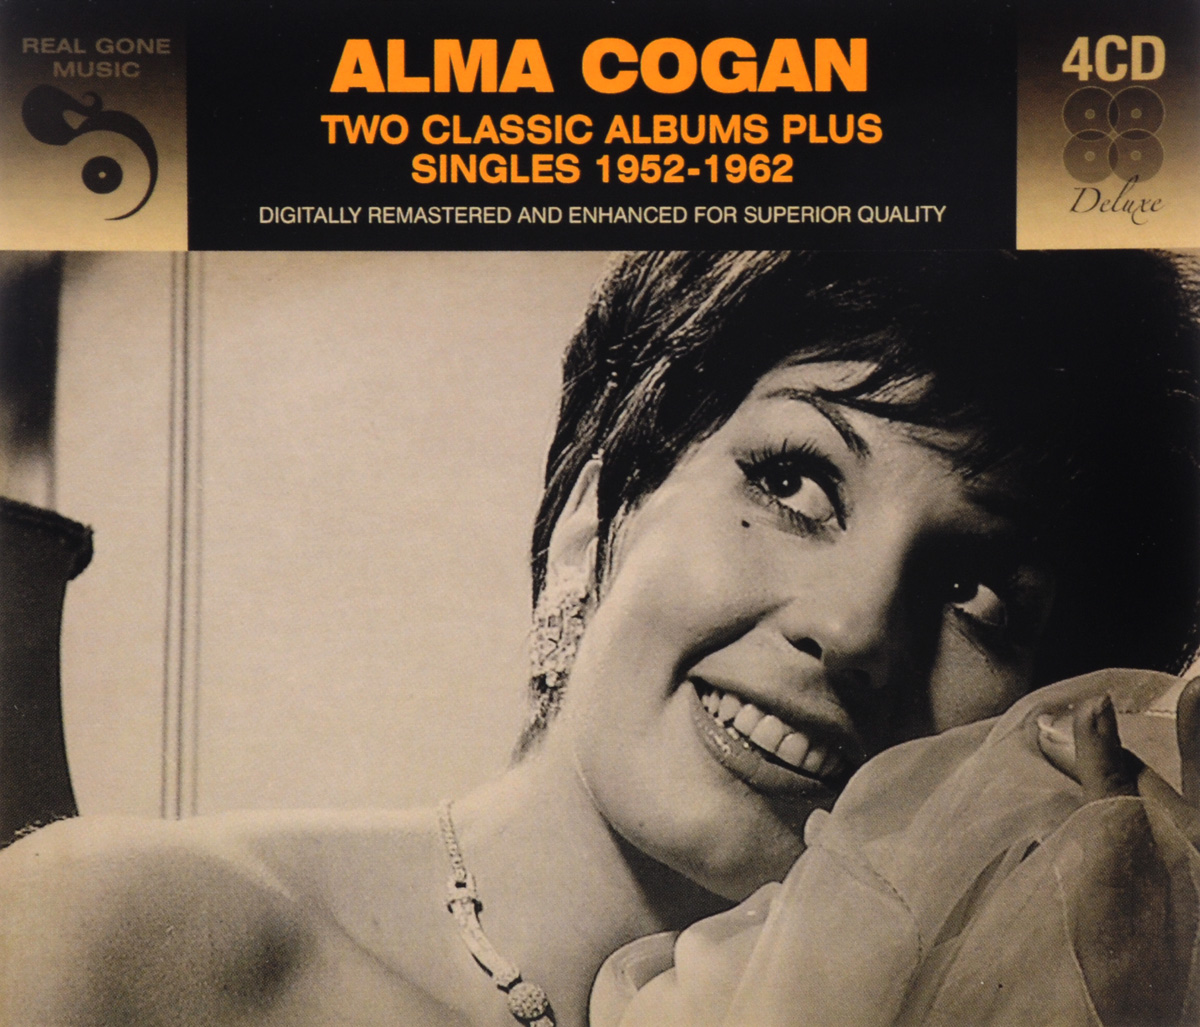 Альма Коган Alma Cogan. 2 Classic Albums Plus Singles 1952-62 (4 CD) sun records 9 classic albums 4 cd